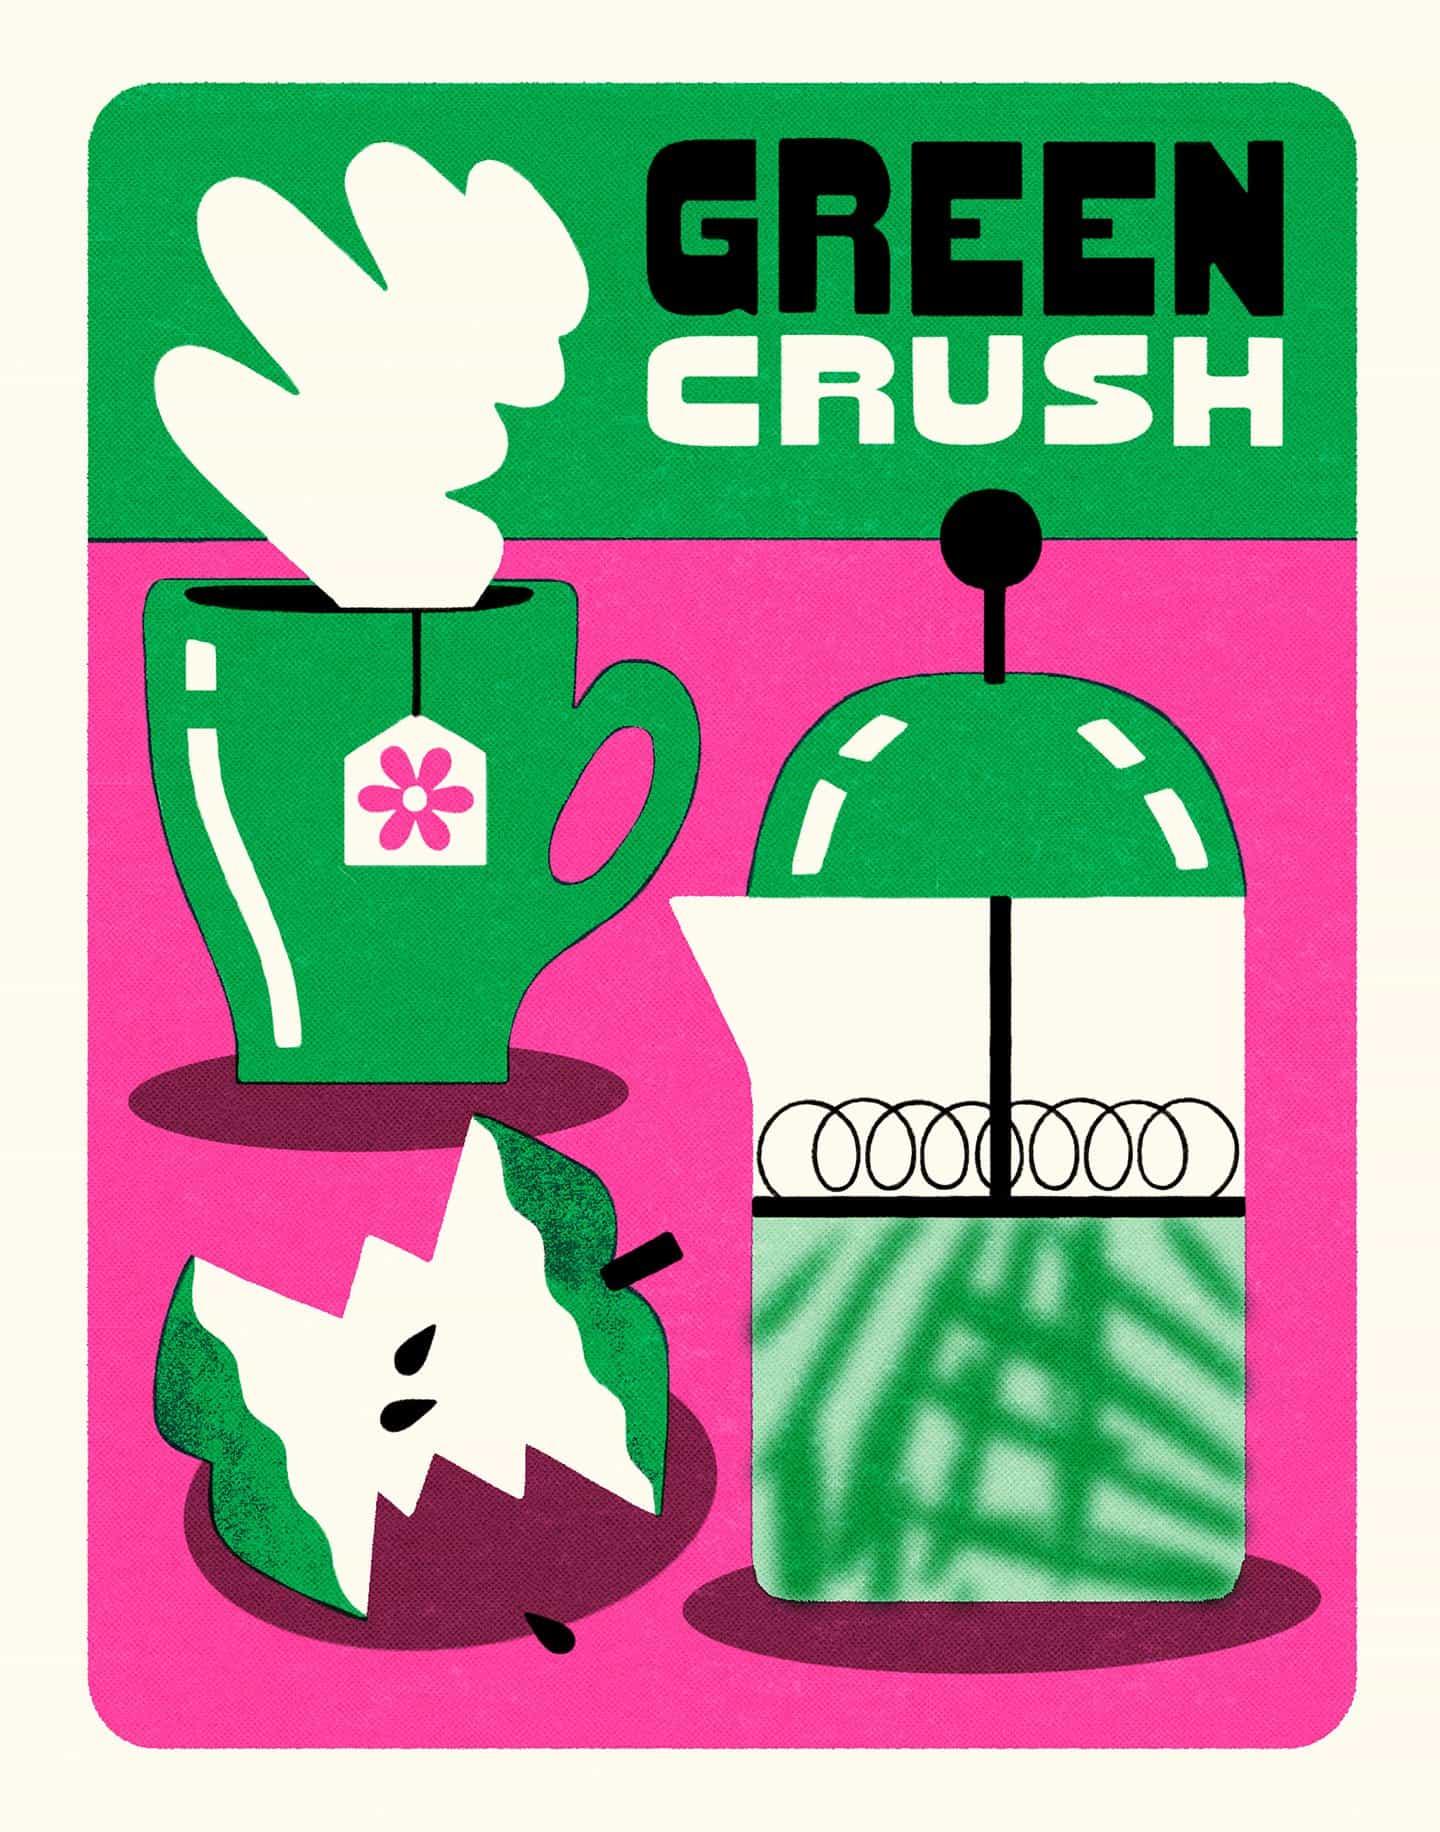 serie de Aless Mc cincuenta tonos de verde ilustra diferentes cepas de cannabis